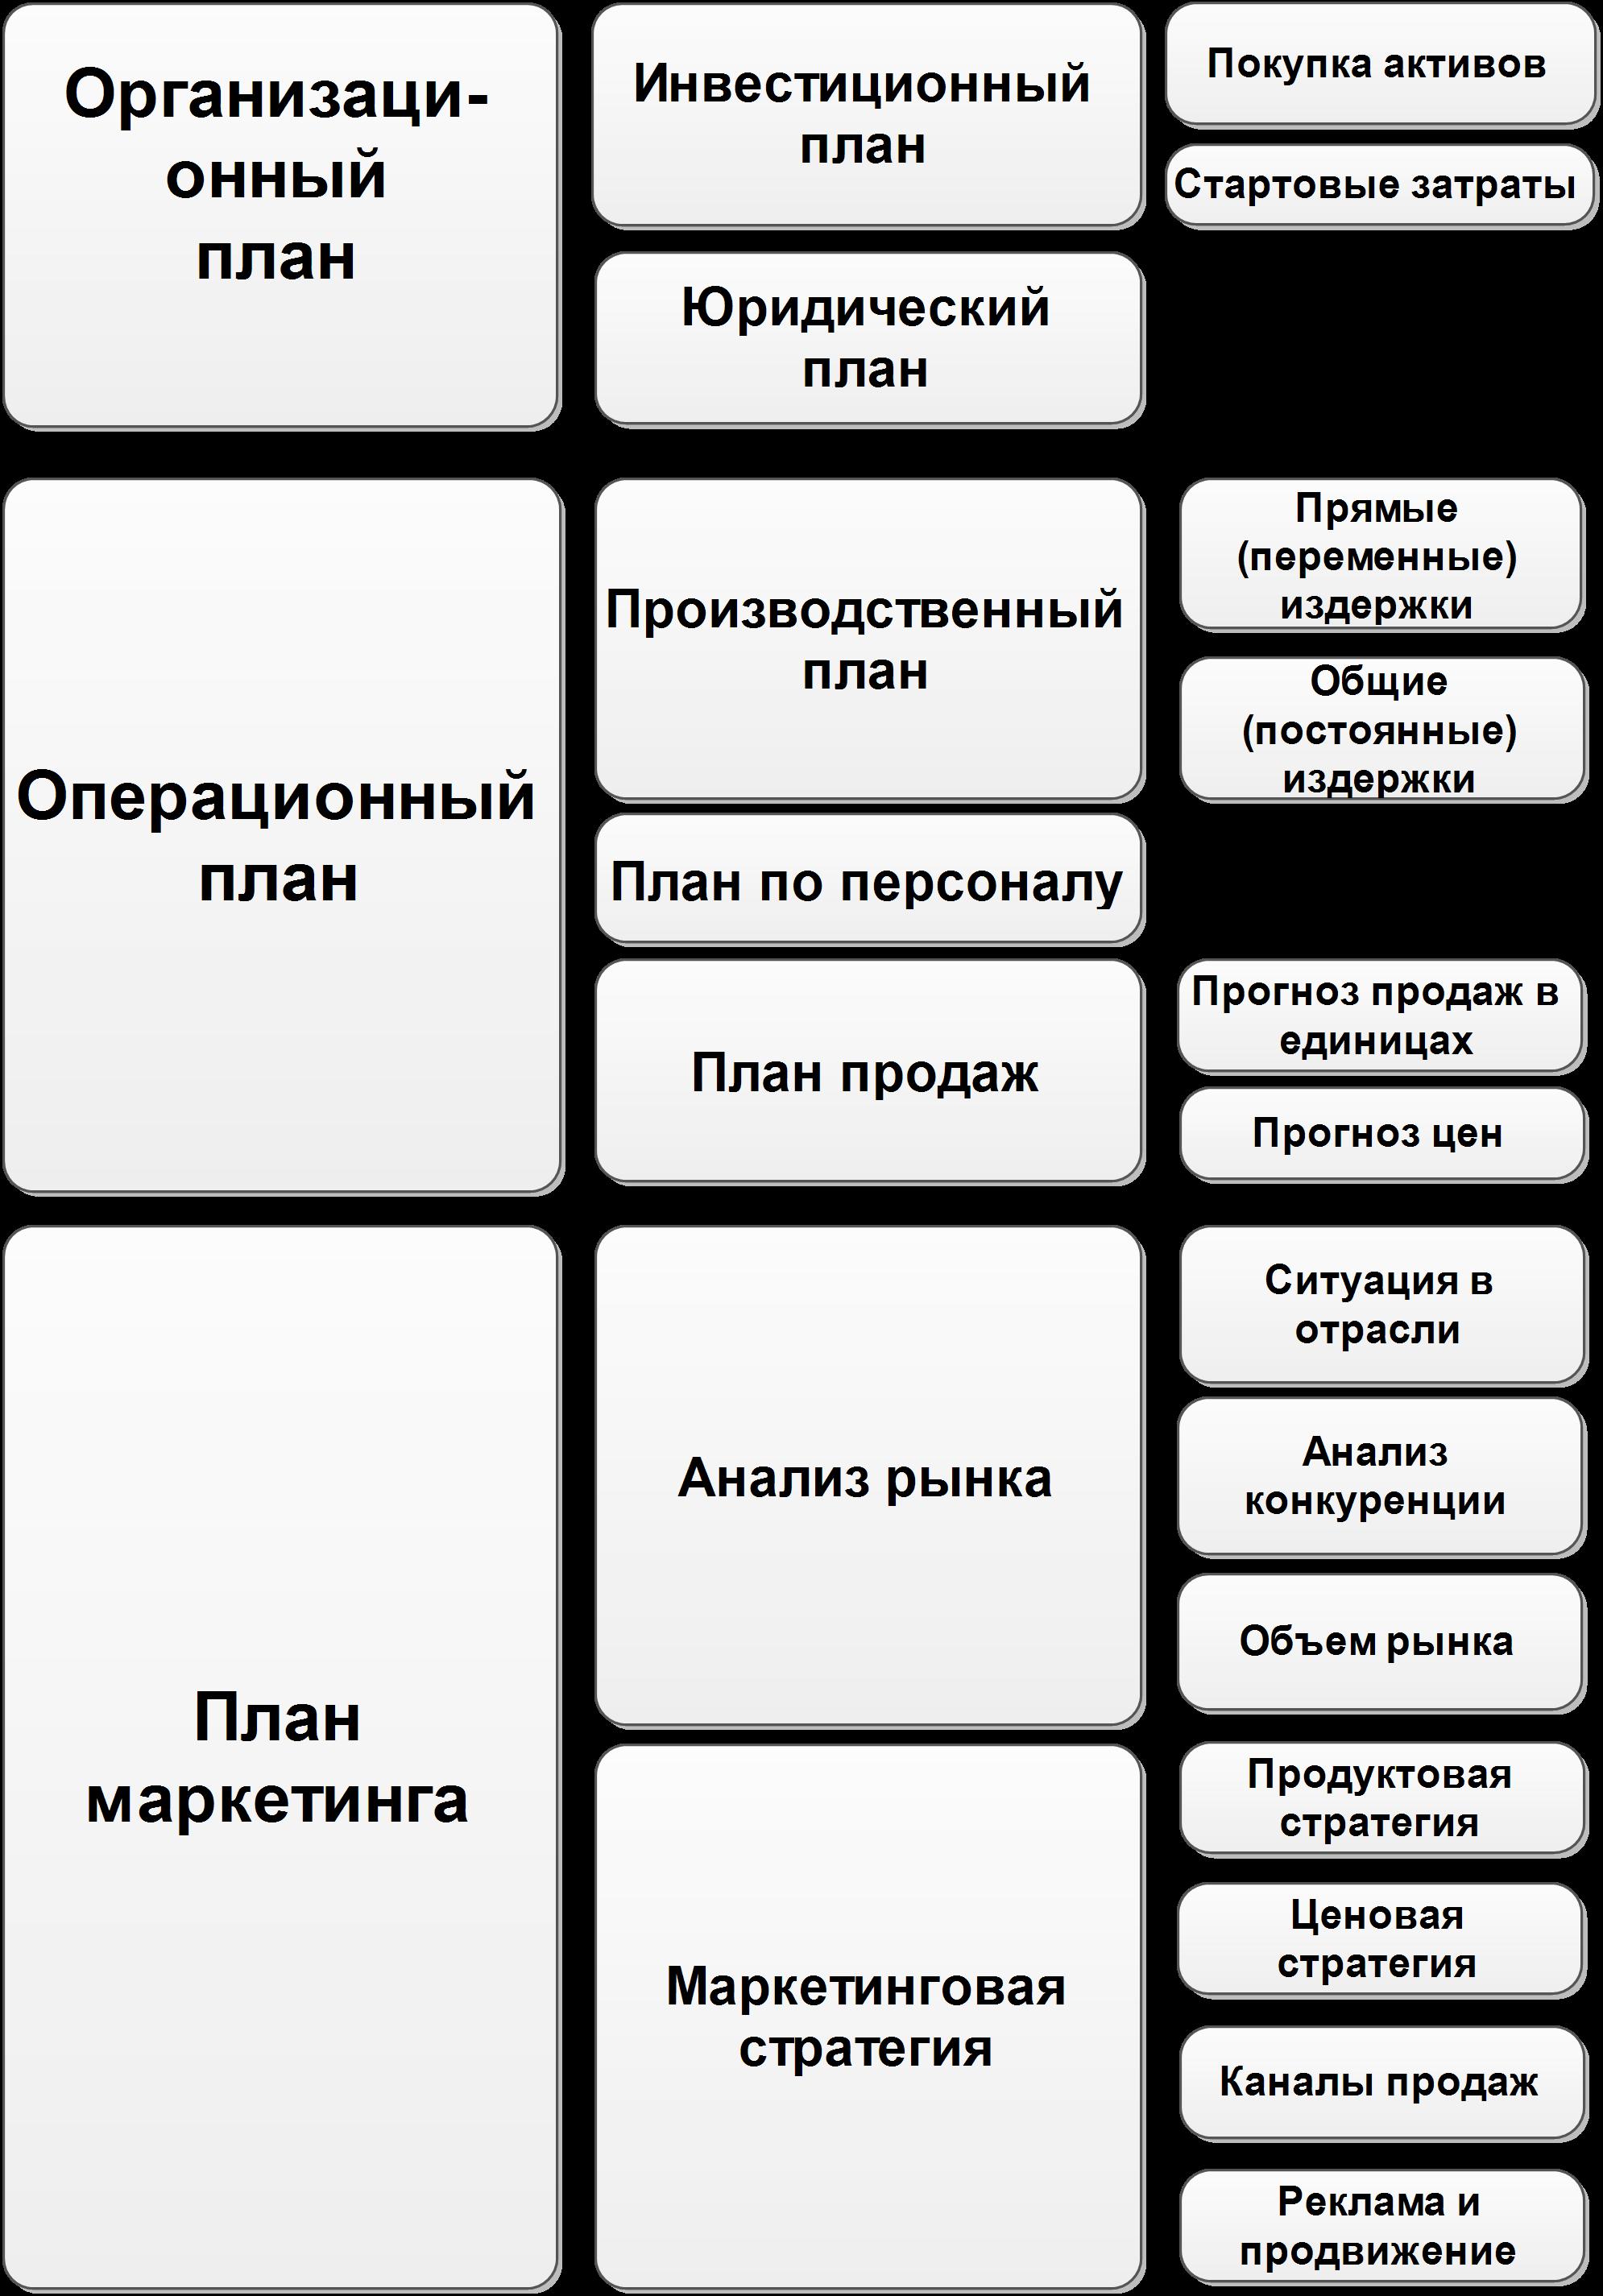 Бизнес план образец птицефабрики бизнес план развития продаж